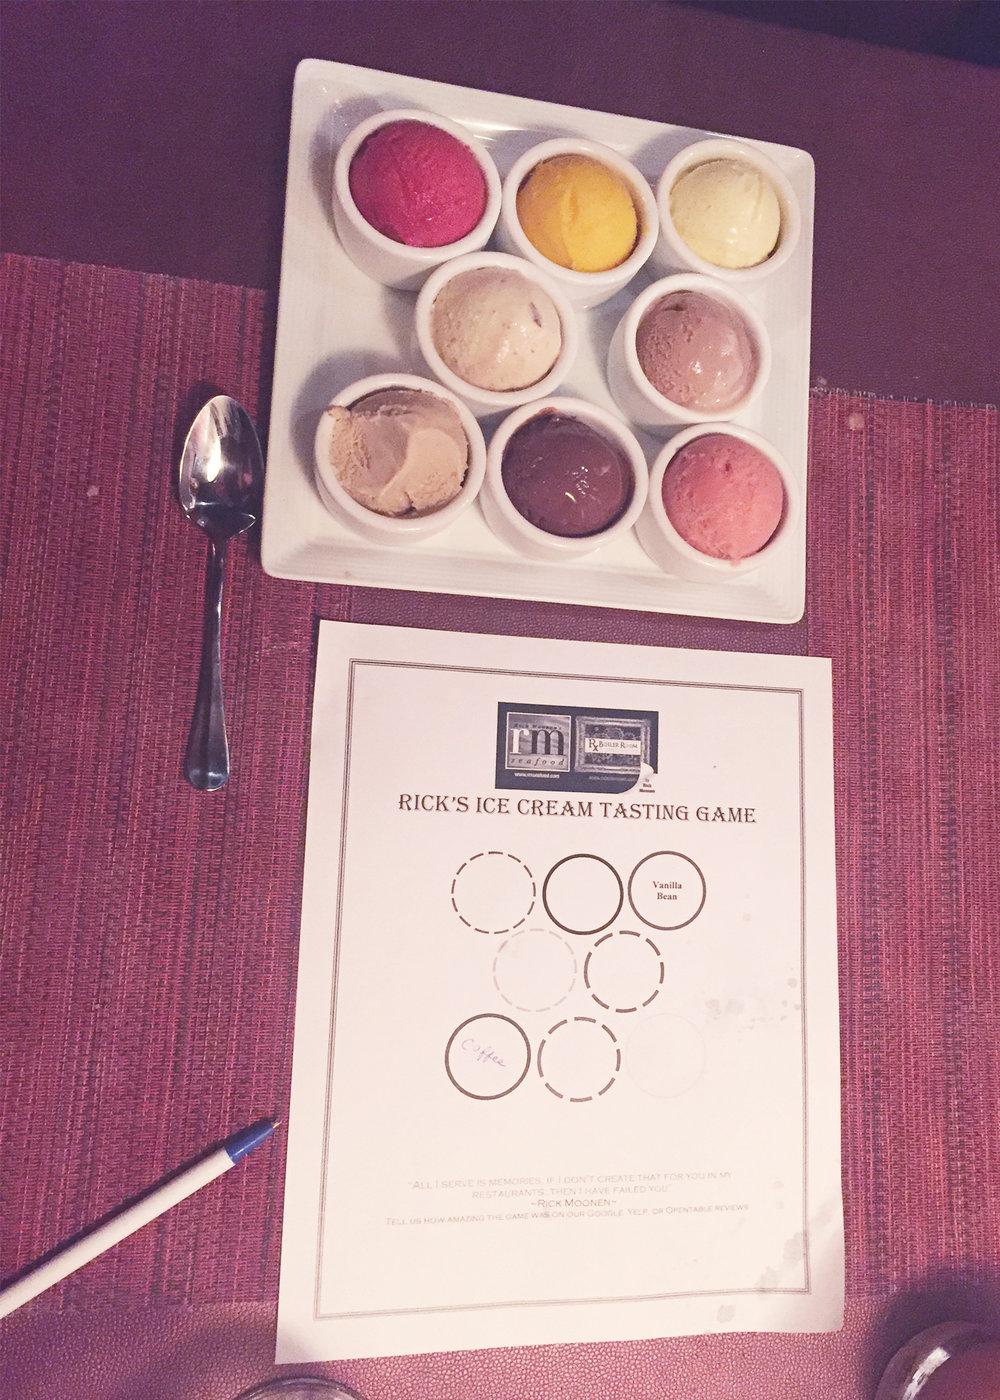 Rx Boiler Room Taste Challenge - Wandering Jokas Travel & Ice Cream Blog